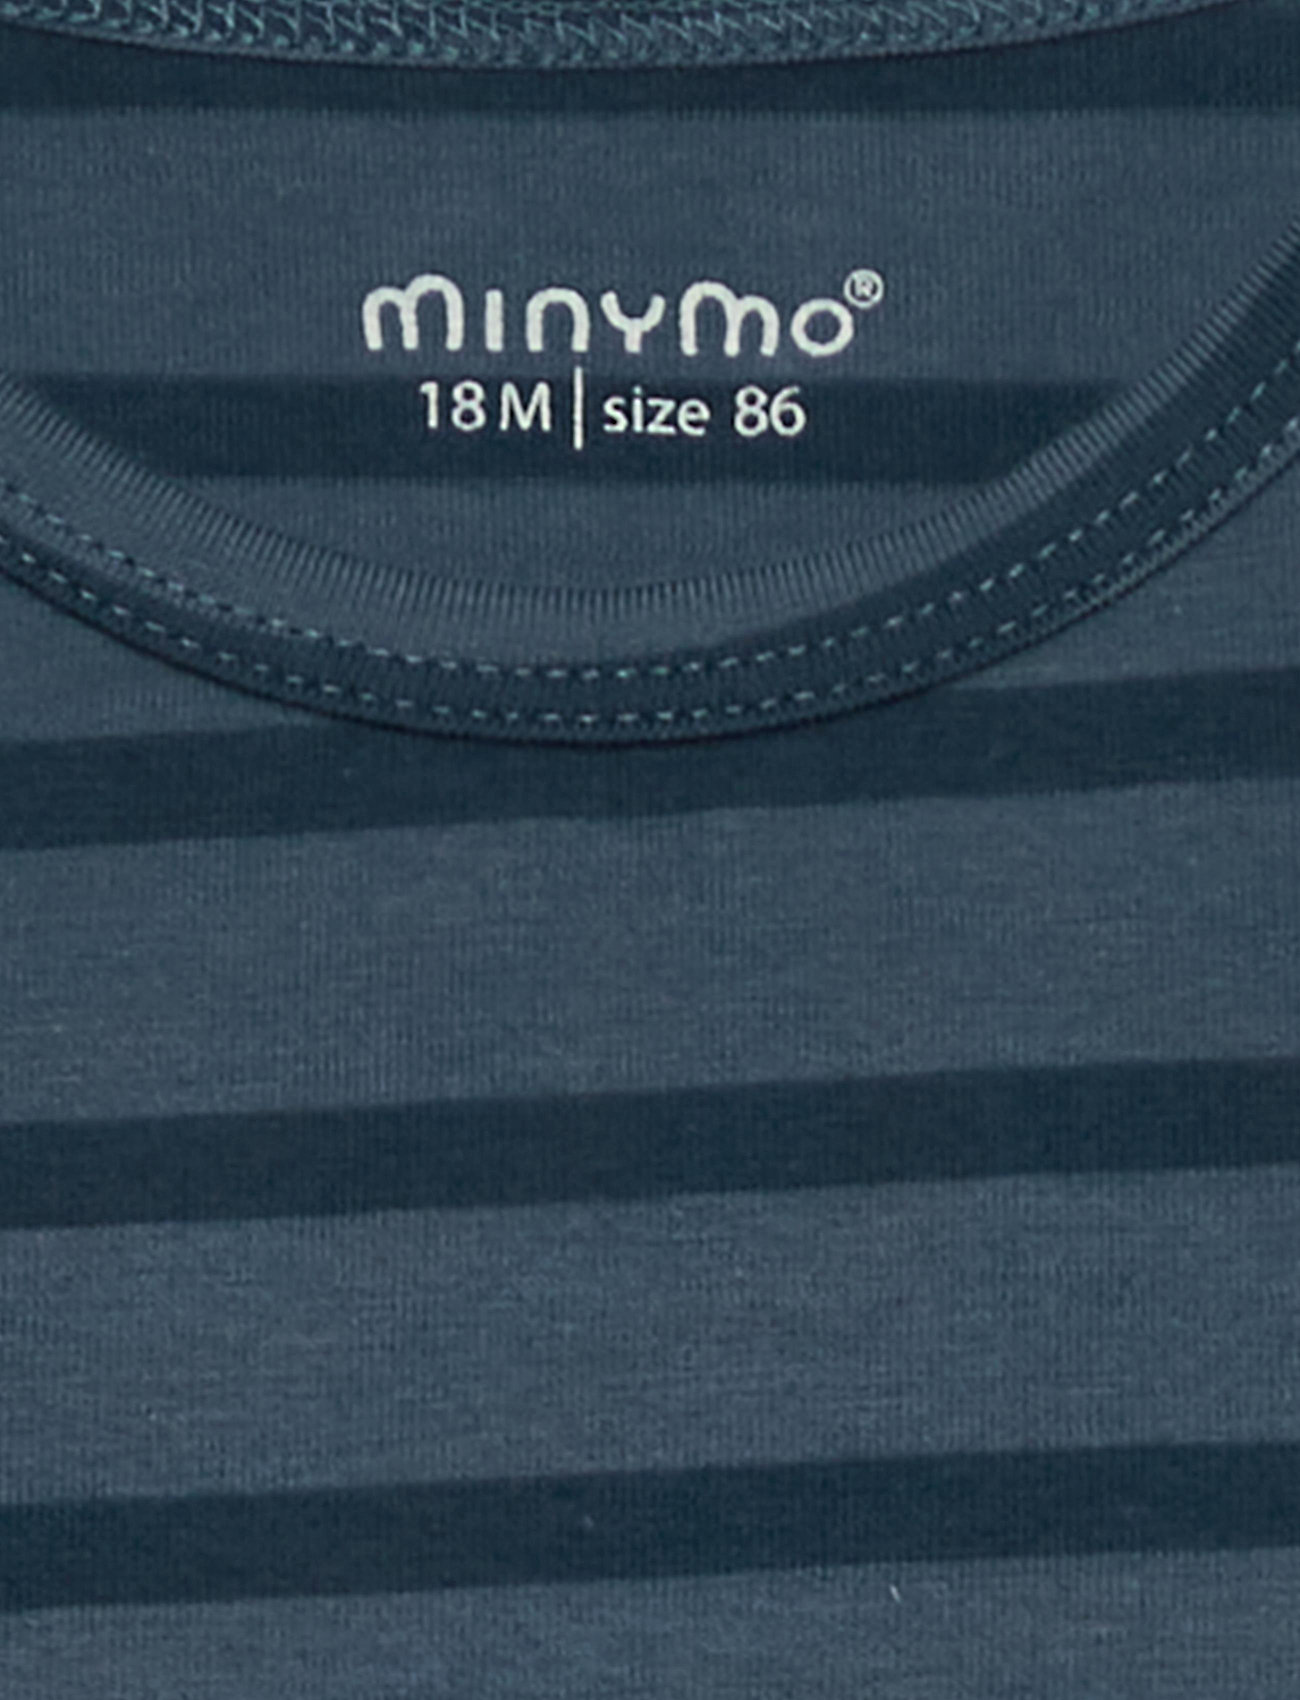 Minymo - Basic 32 -T-shirt SS (2-pack) - t-krekli ar īsām piedurknēm - new navy - 0